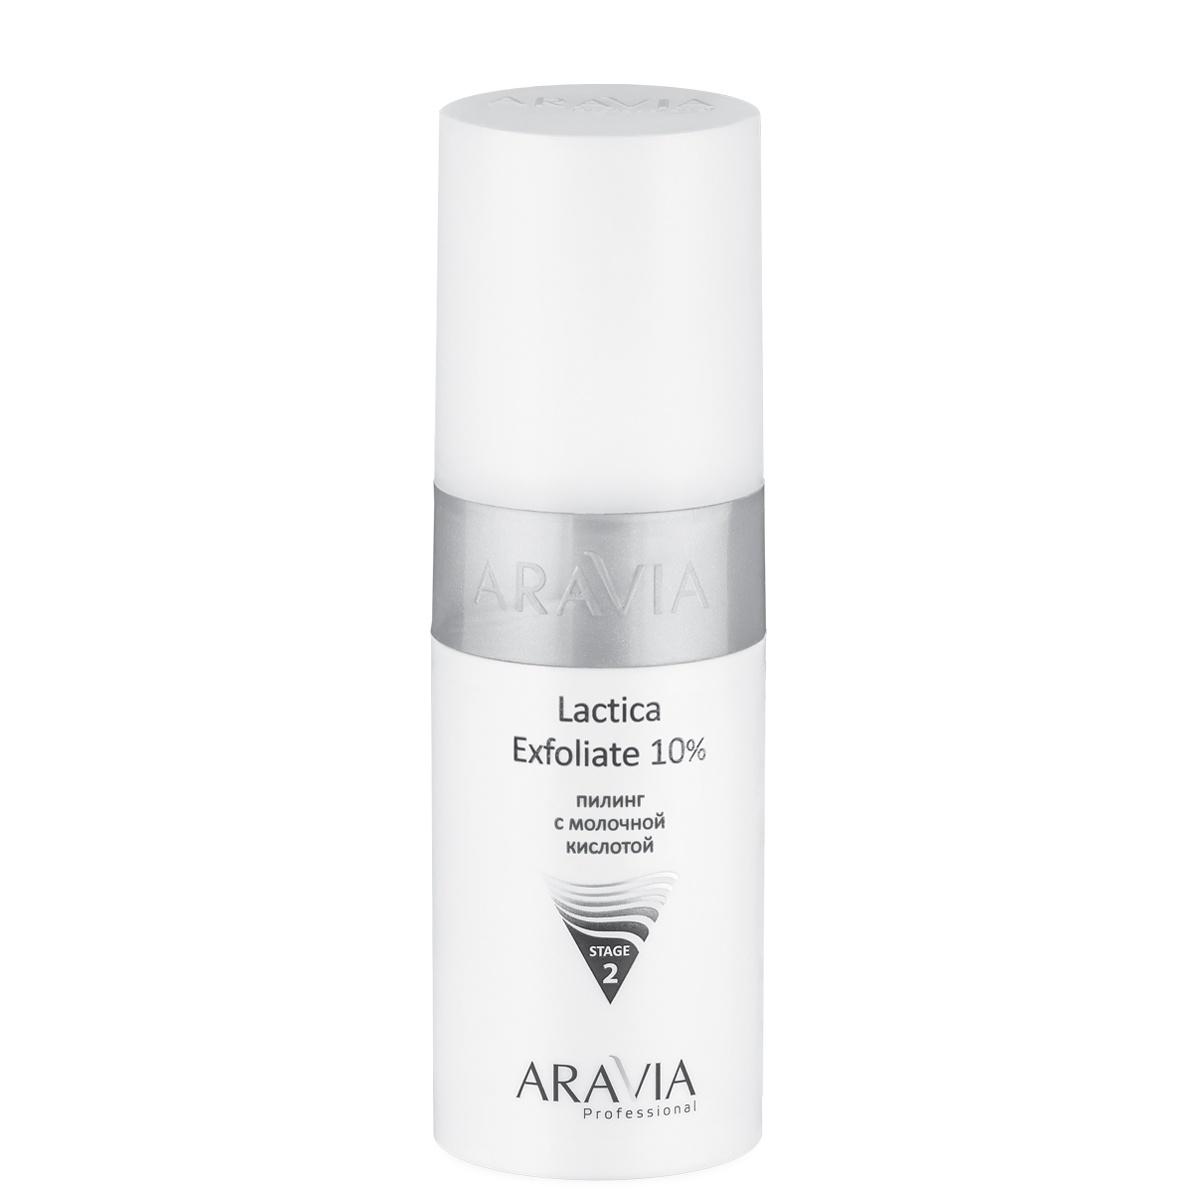 Пилинг с молочной кислотой Lactica Exfoliate 10%, 150 мл, ARAVIA Professional